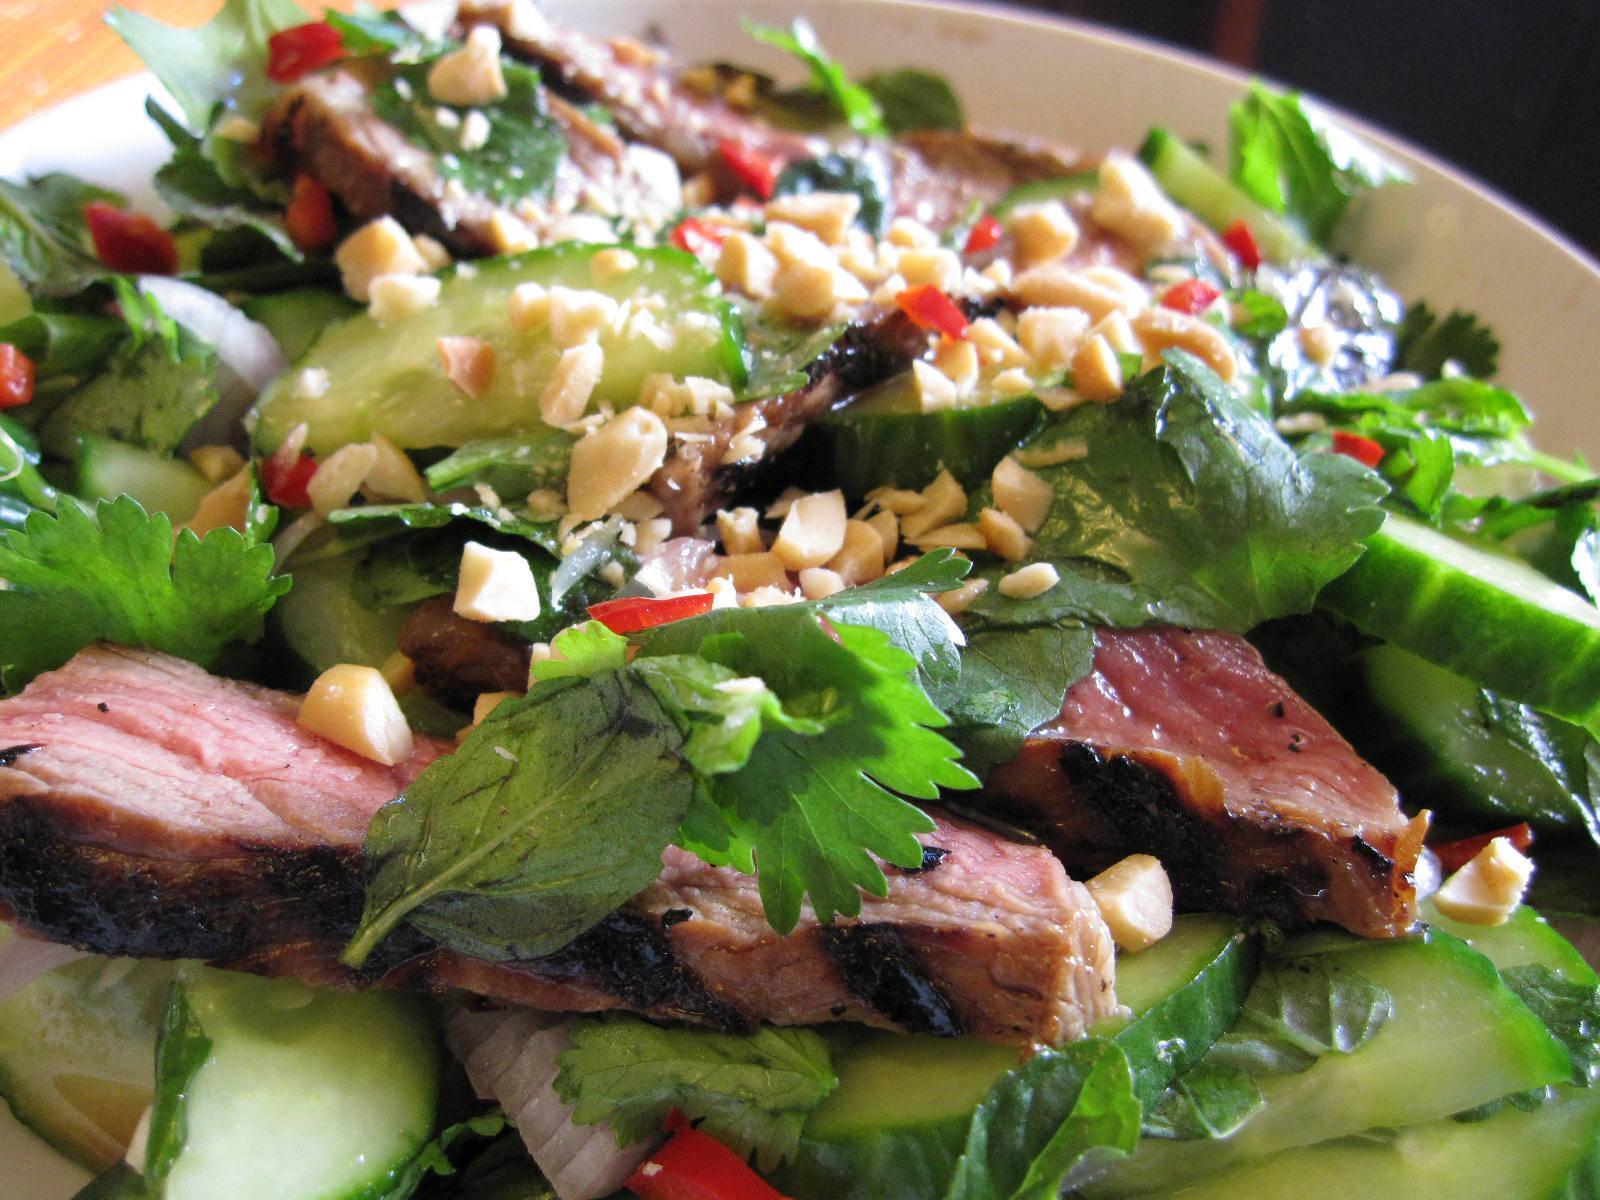 Салат из мяса индейки рецепт пошагово в